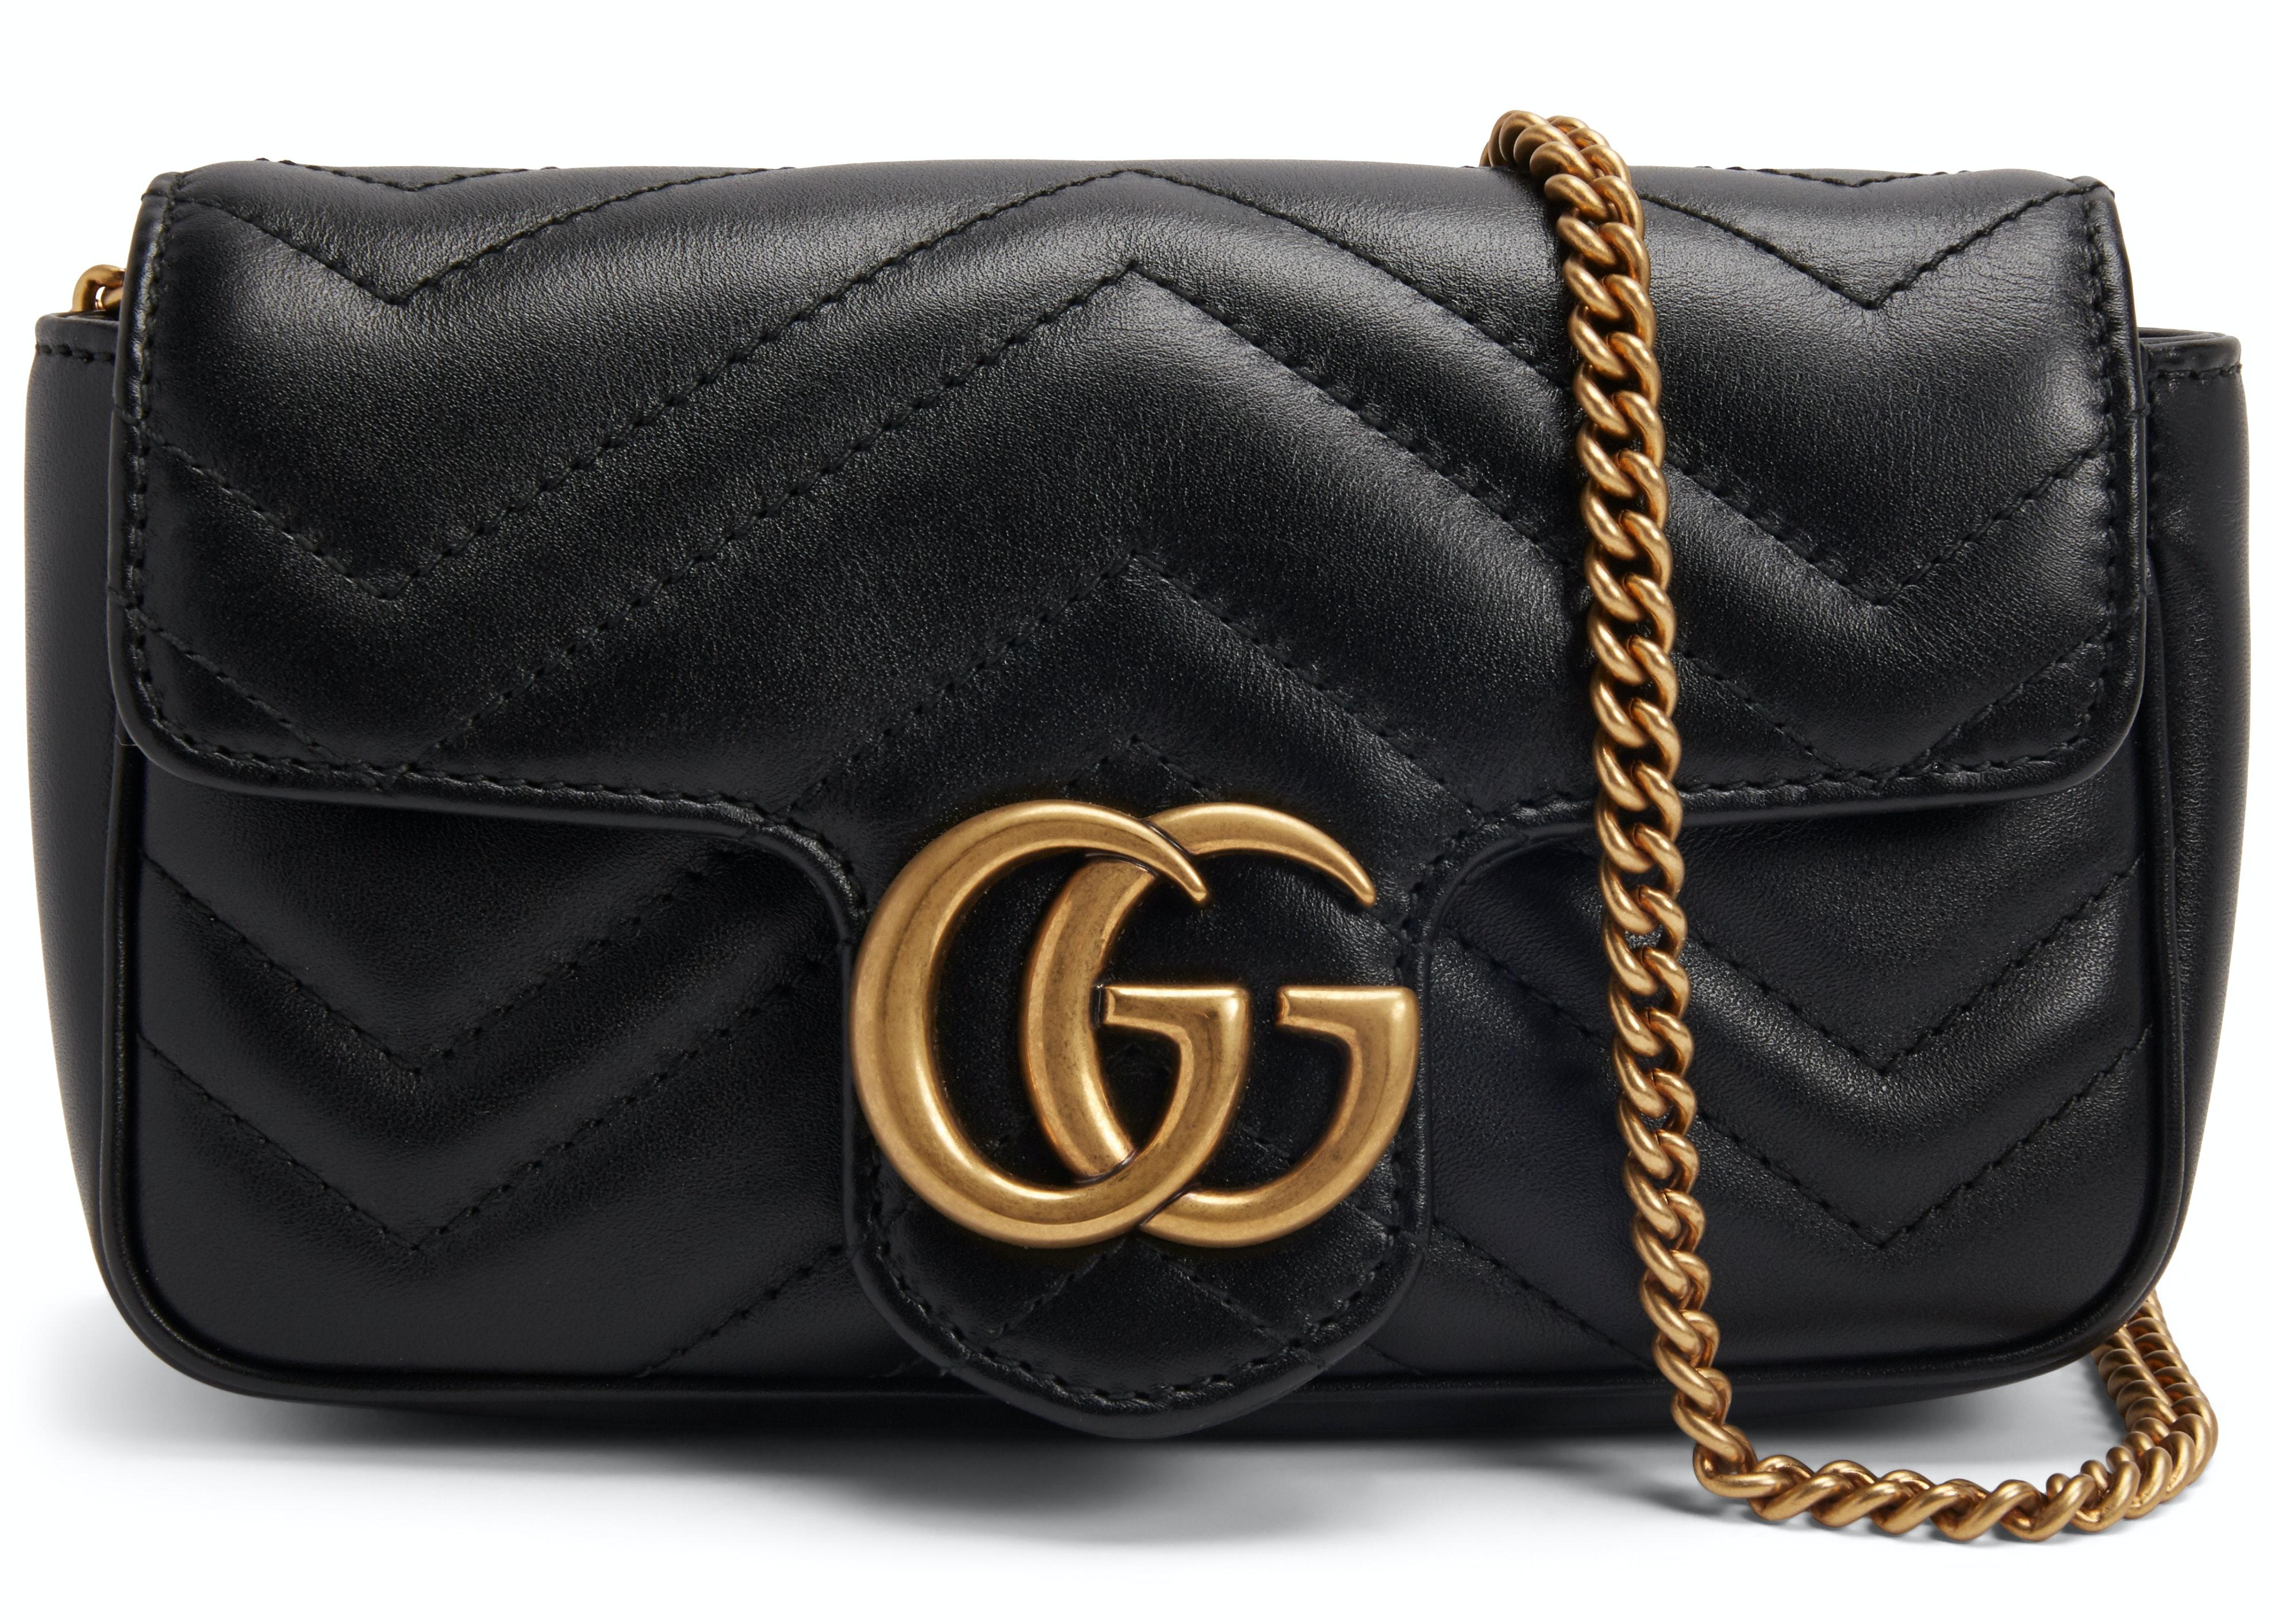 Gucci Marmont Matelasse Super Mini Black